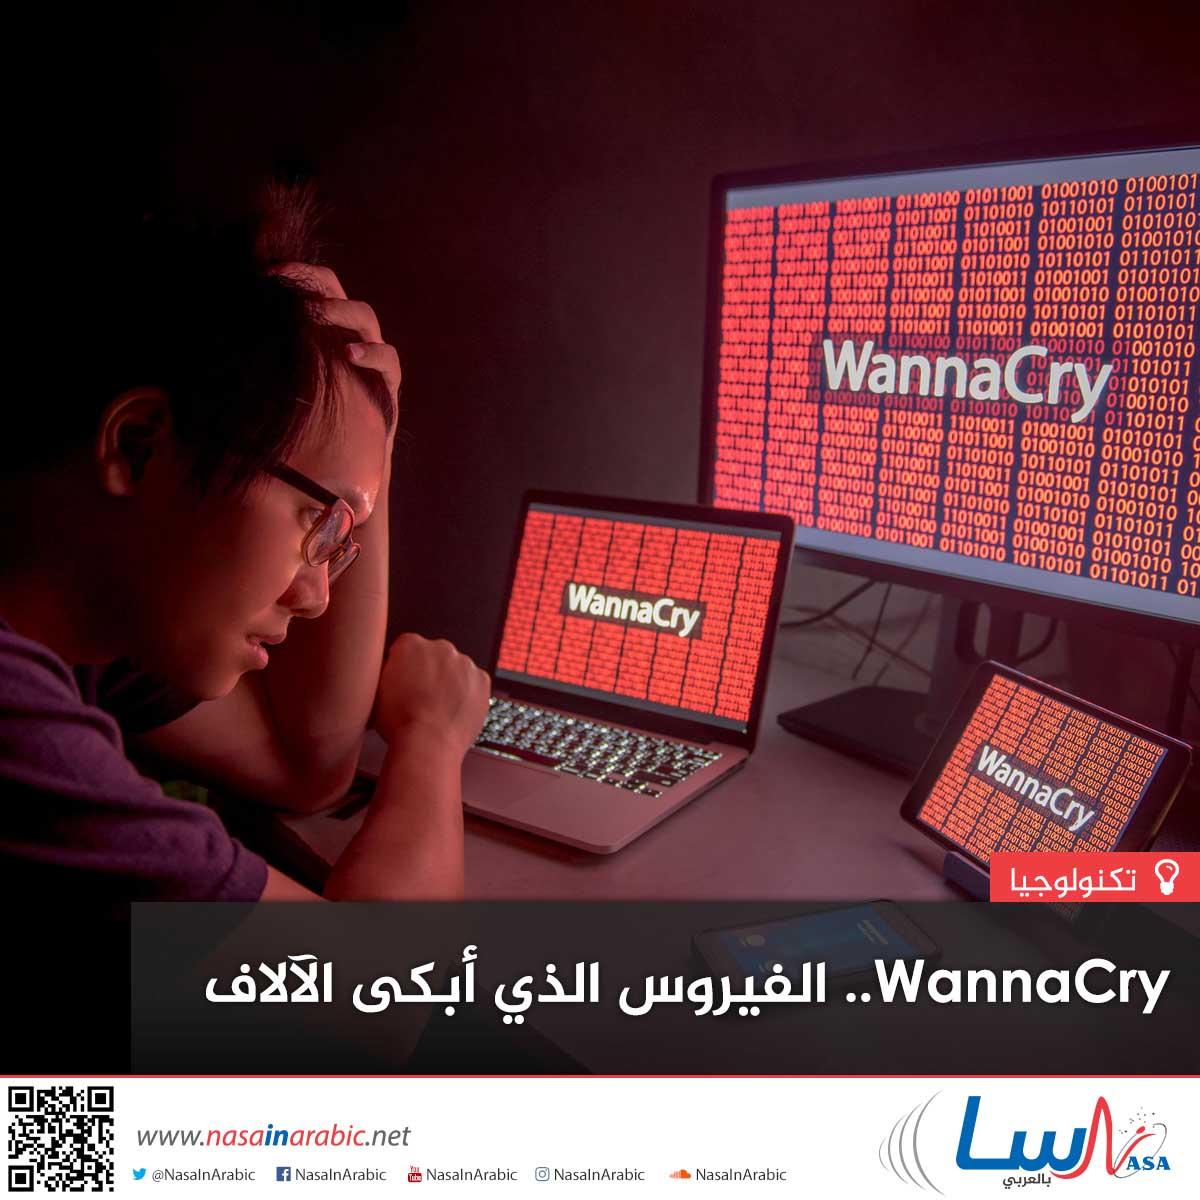 WannaCry: الفيروس الذي أبكى الآلاف